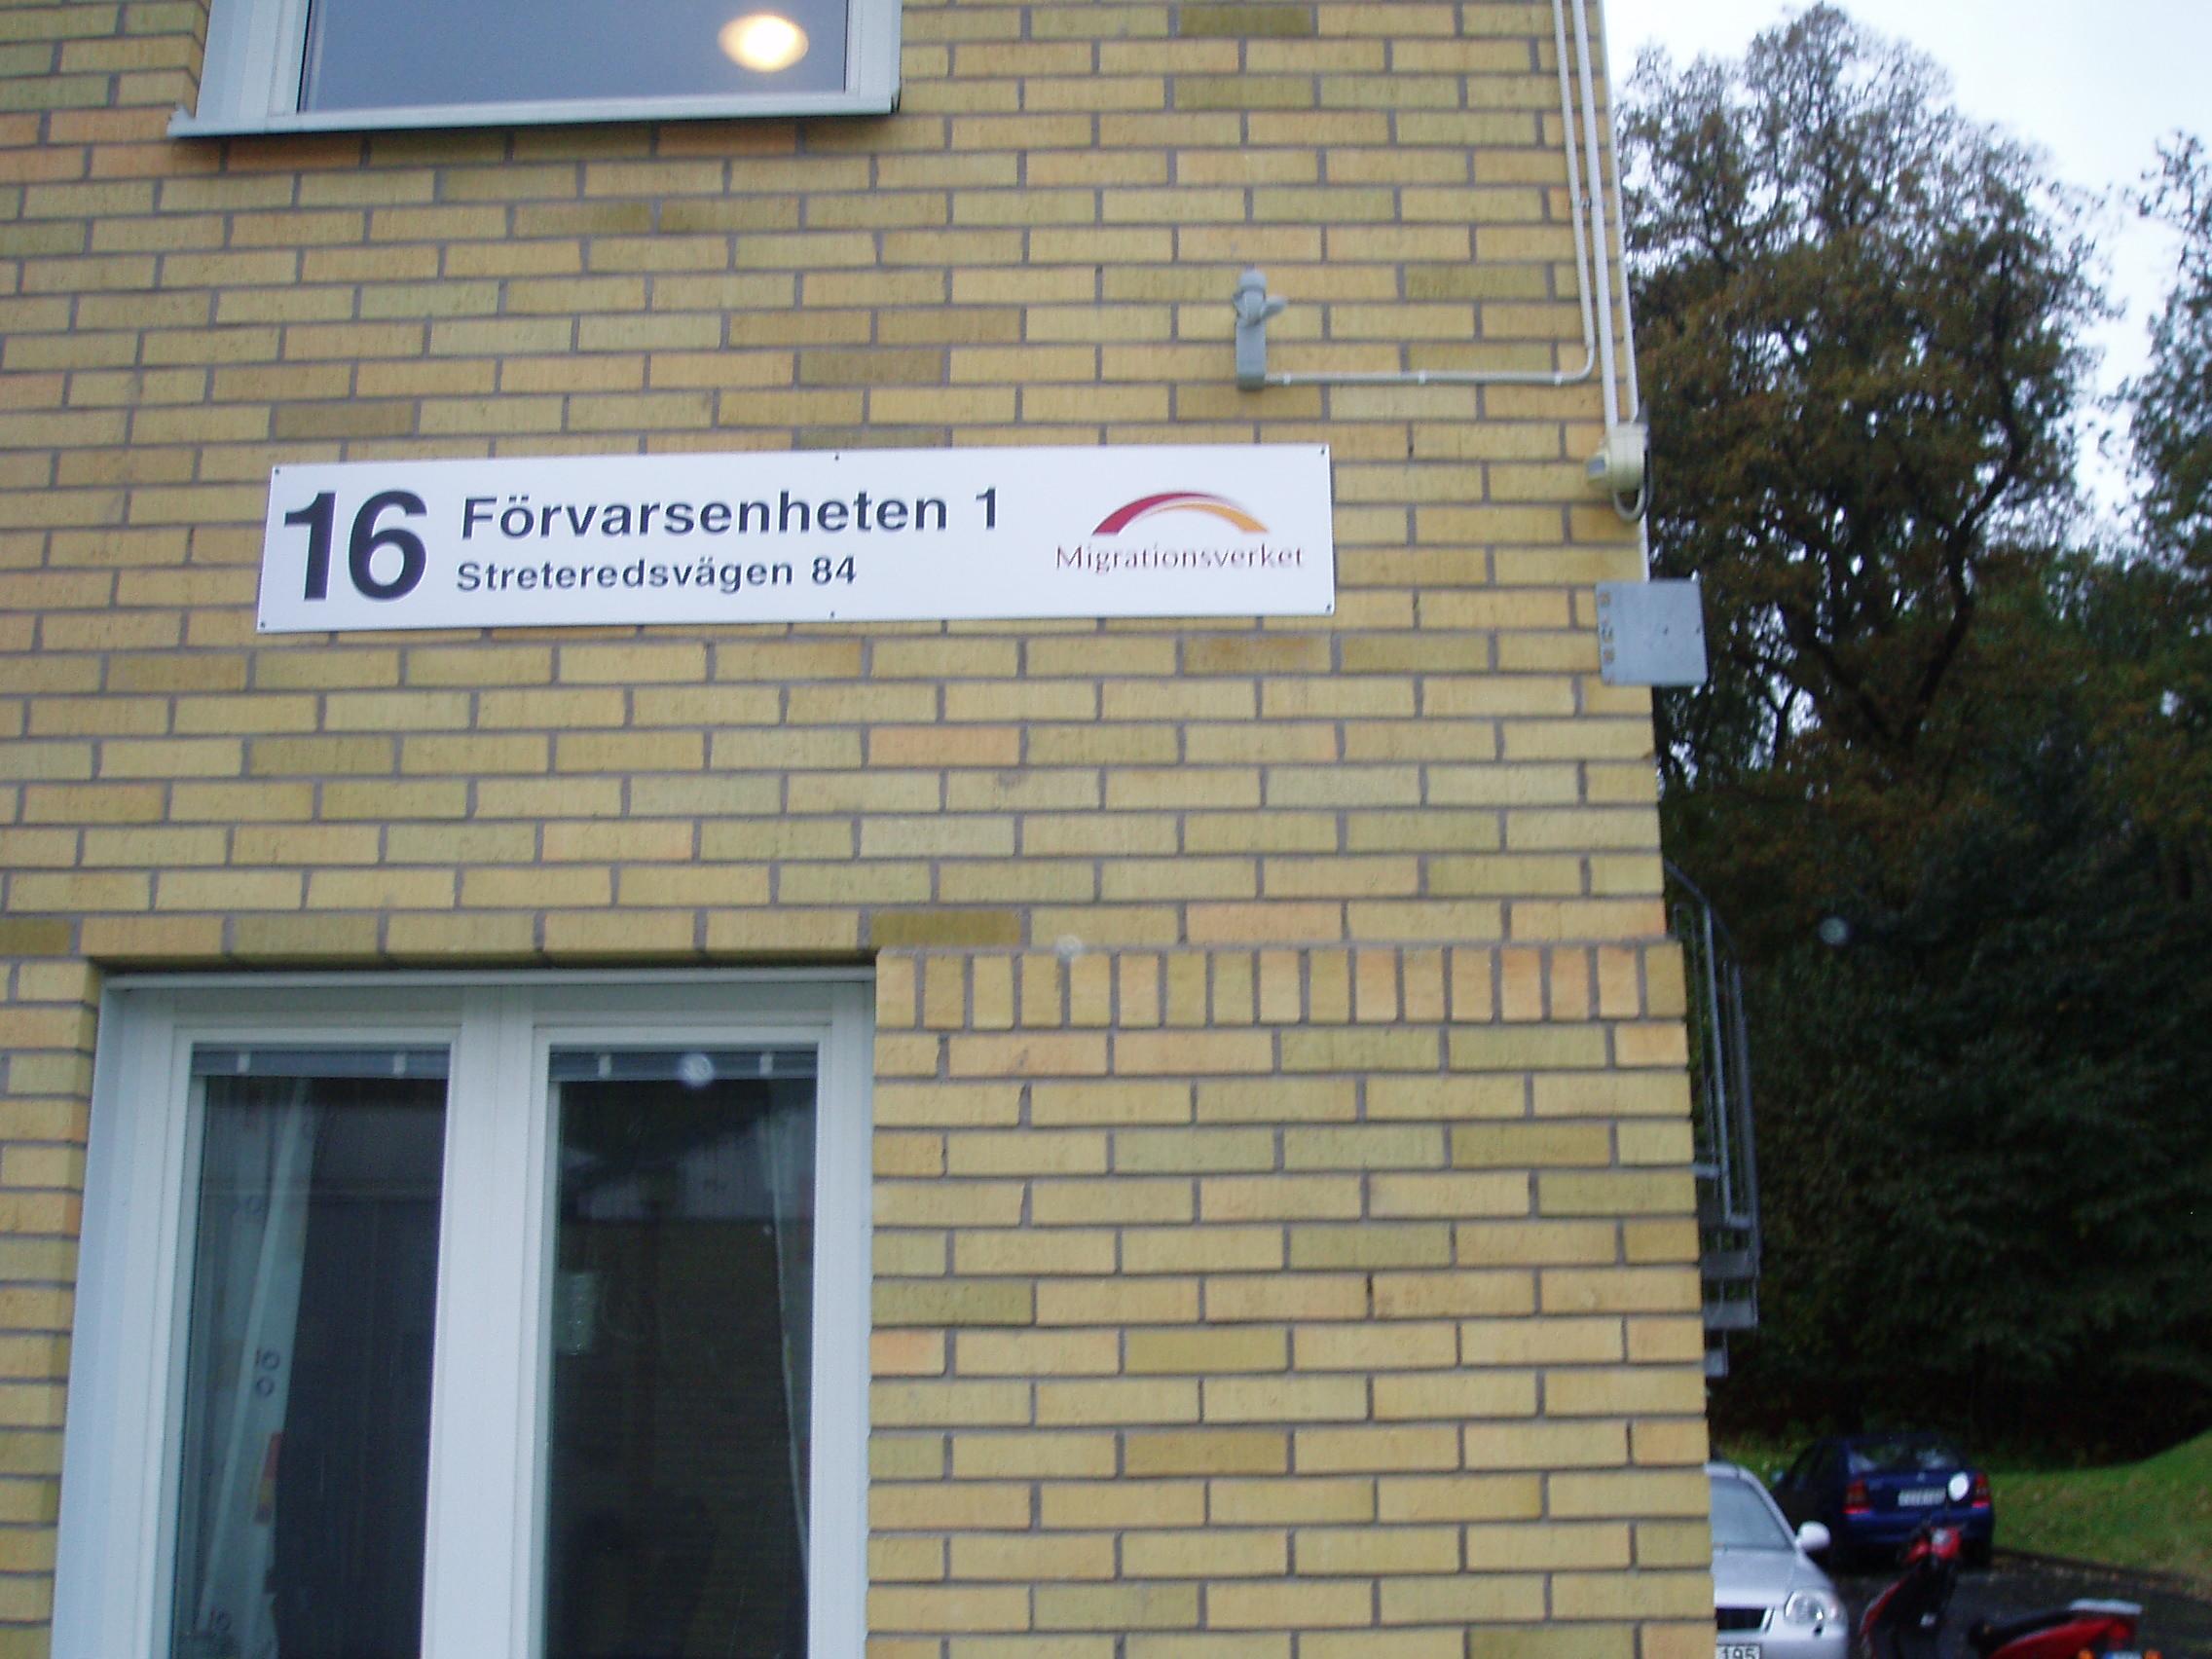 Kållered (Göteborg), Imäi Göteborg: Utvisningshotad släpptes ur förvaret, https://www.ingenillegal.org/artiklar/utvisningshotad-slapptes-ur-forvaret